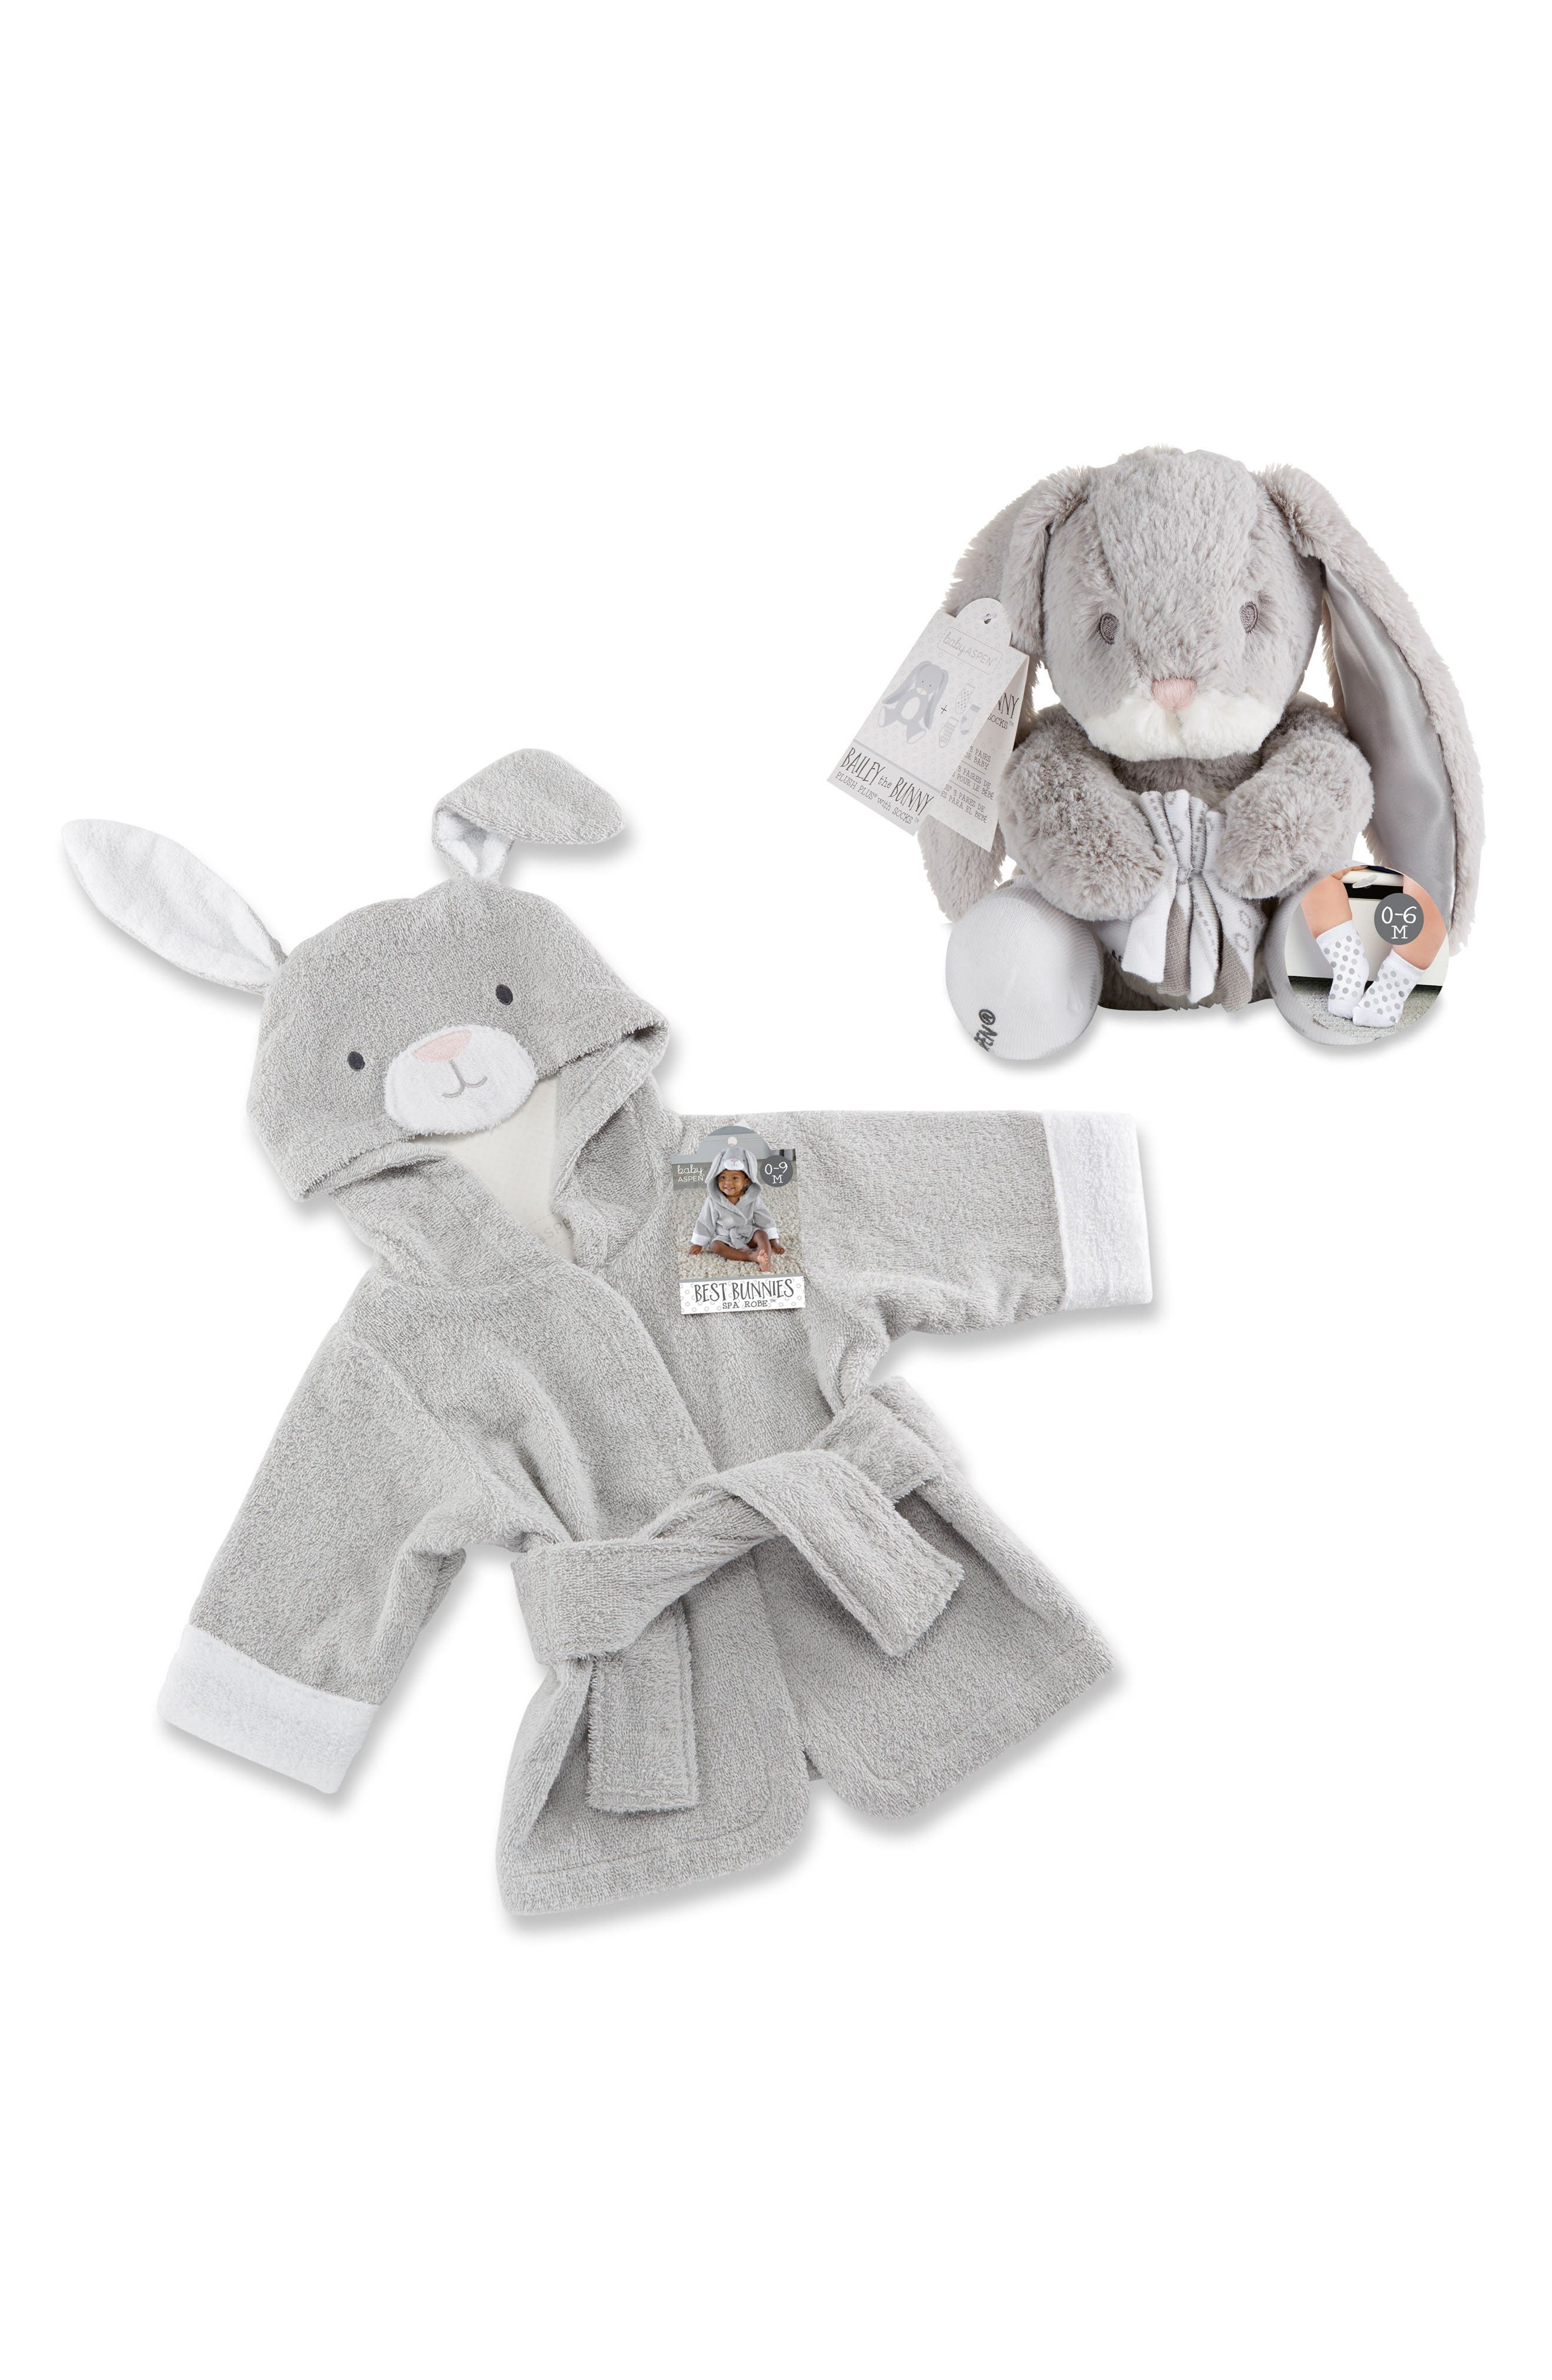 Alternate Image 1 Selected - Baby Aspen Bunnie Hooded Robe & Stuffed Animal